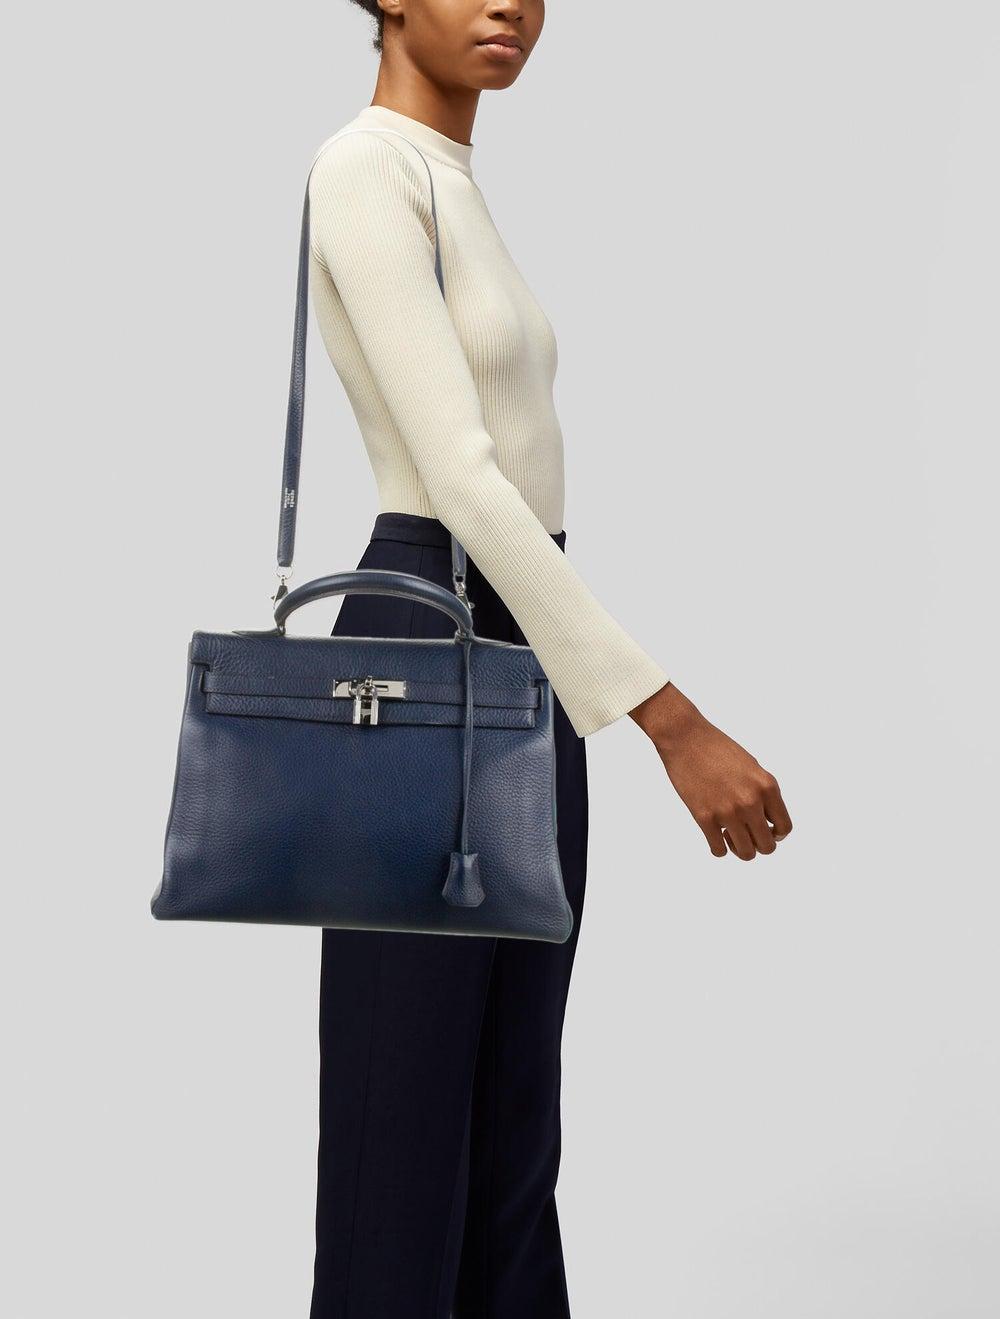 Hermès Vintage Clemence Kelly Retourne 35 Blue - image 2